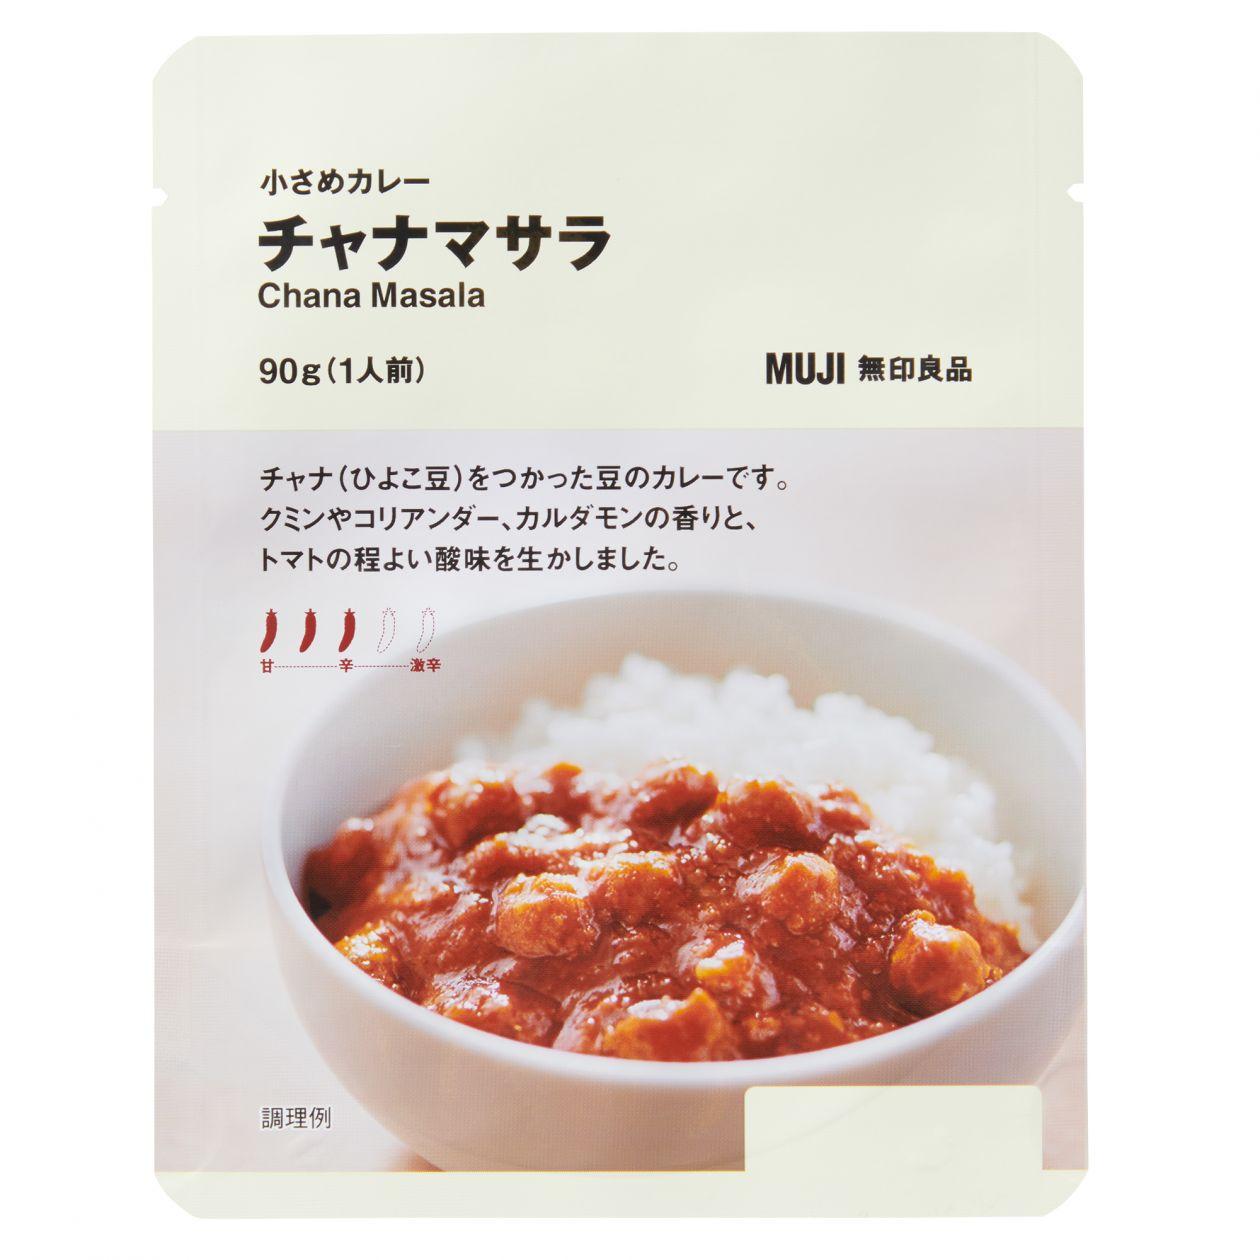 Mujirushi Ryohin Chana Masala Small Curry